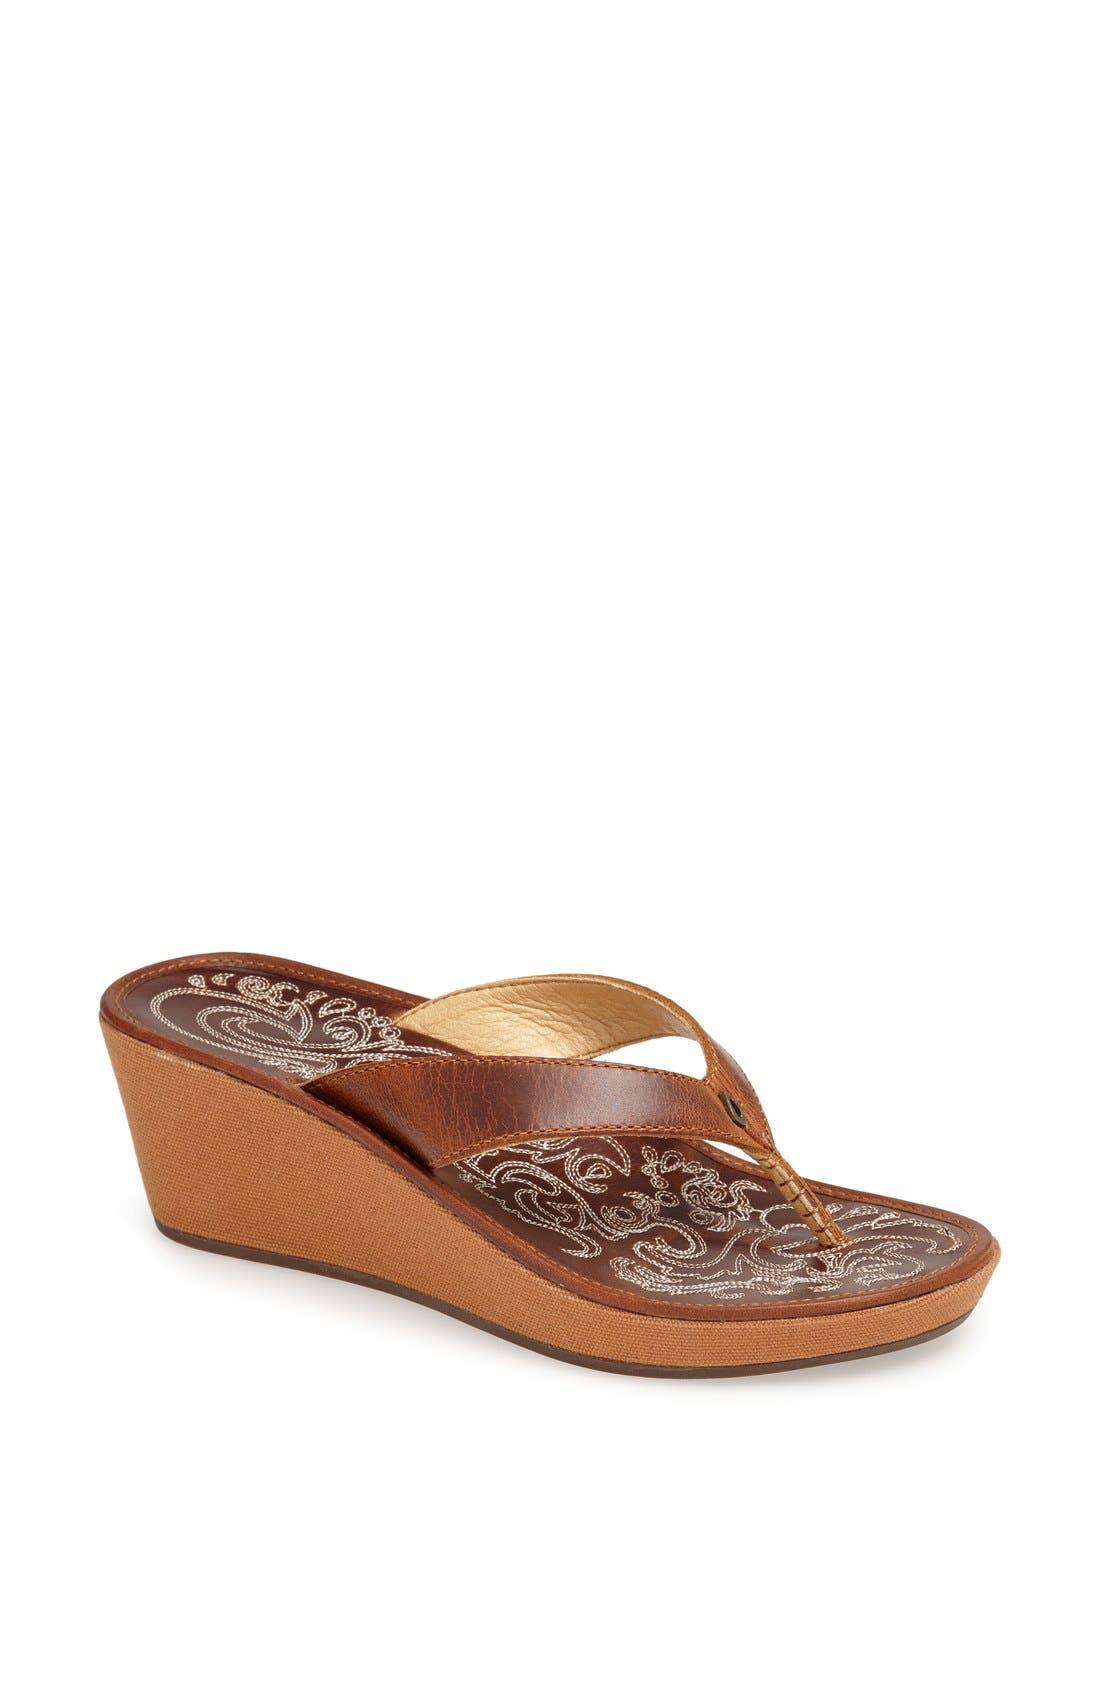 Alternate Image 1 Selected - OluKai 'Kaula Lio' Sandal